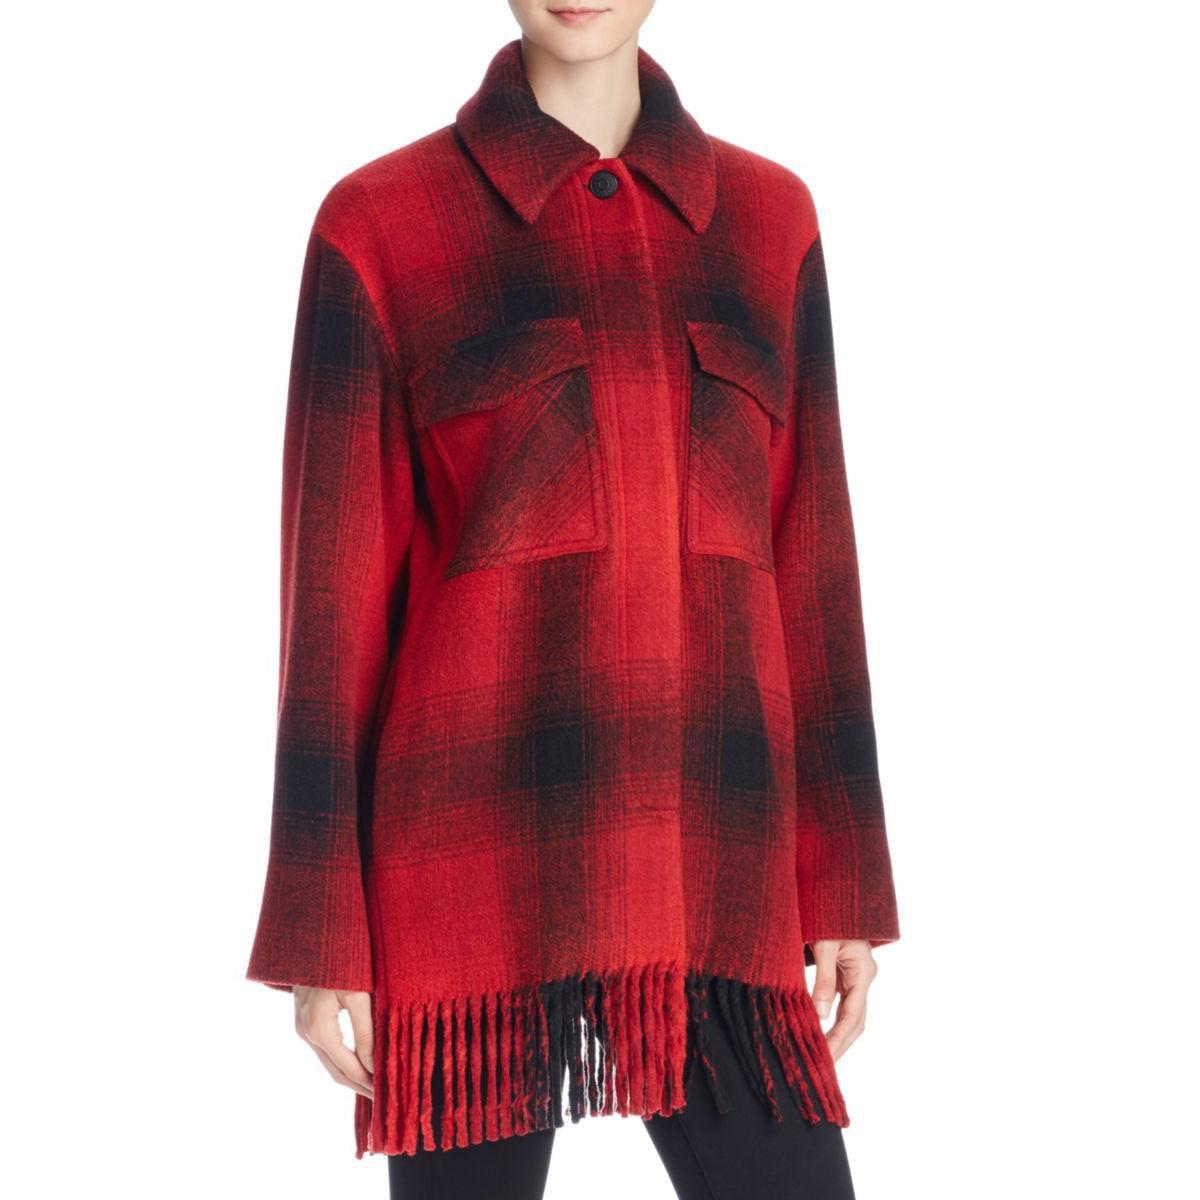 T by Alexander Wang Womens Wool Plaid Coat by Womens Wool Coats